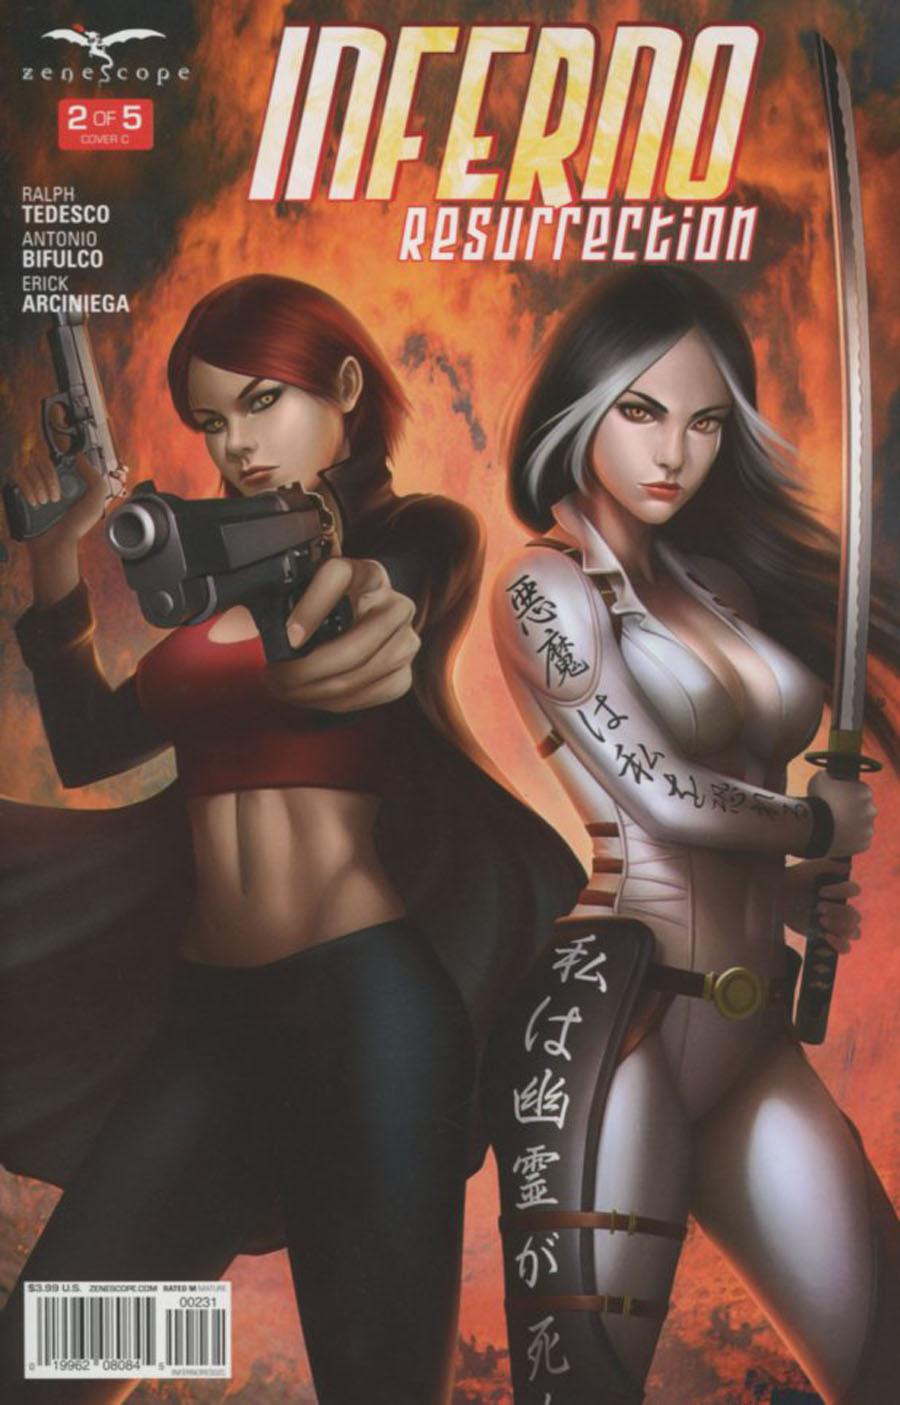 Grimm Fairy Tales Presents Inferno Resurrection #2 Cover C Meguro